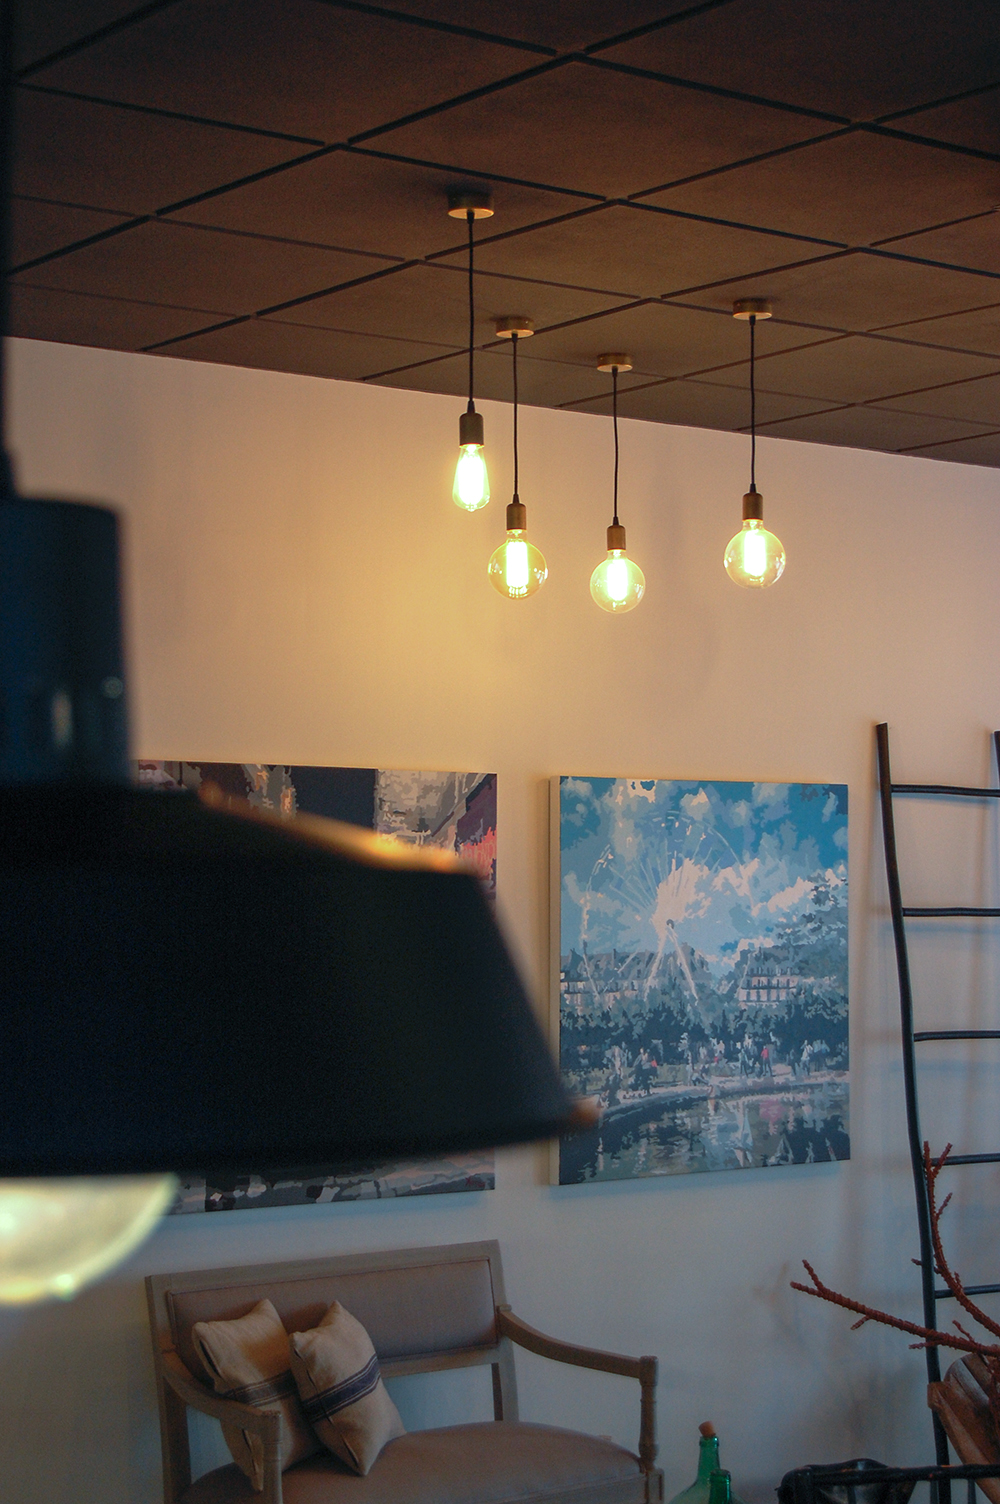 iluminacion con bombillas de filamento